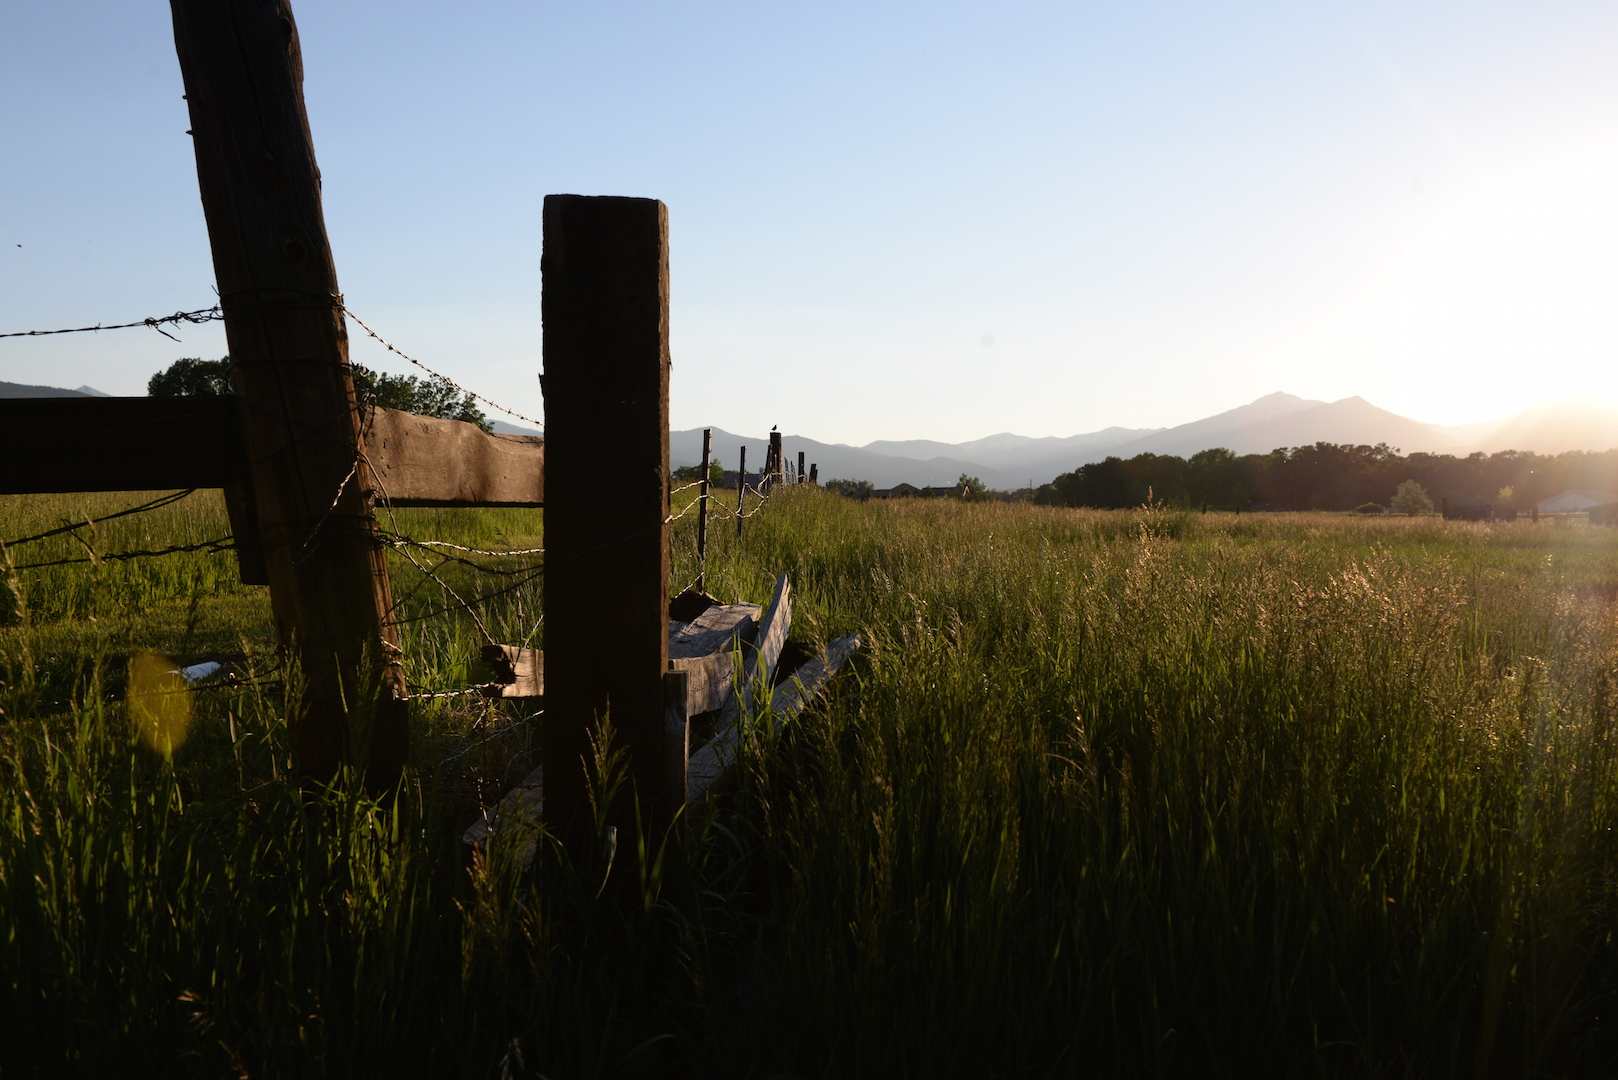 Salida landscape. Photo courtesy FIBArk